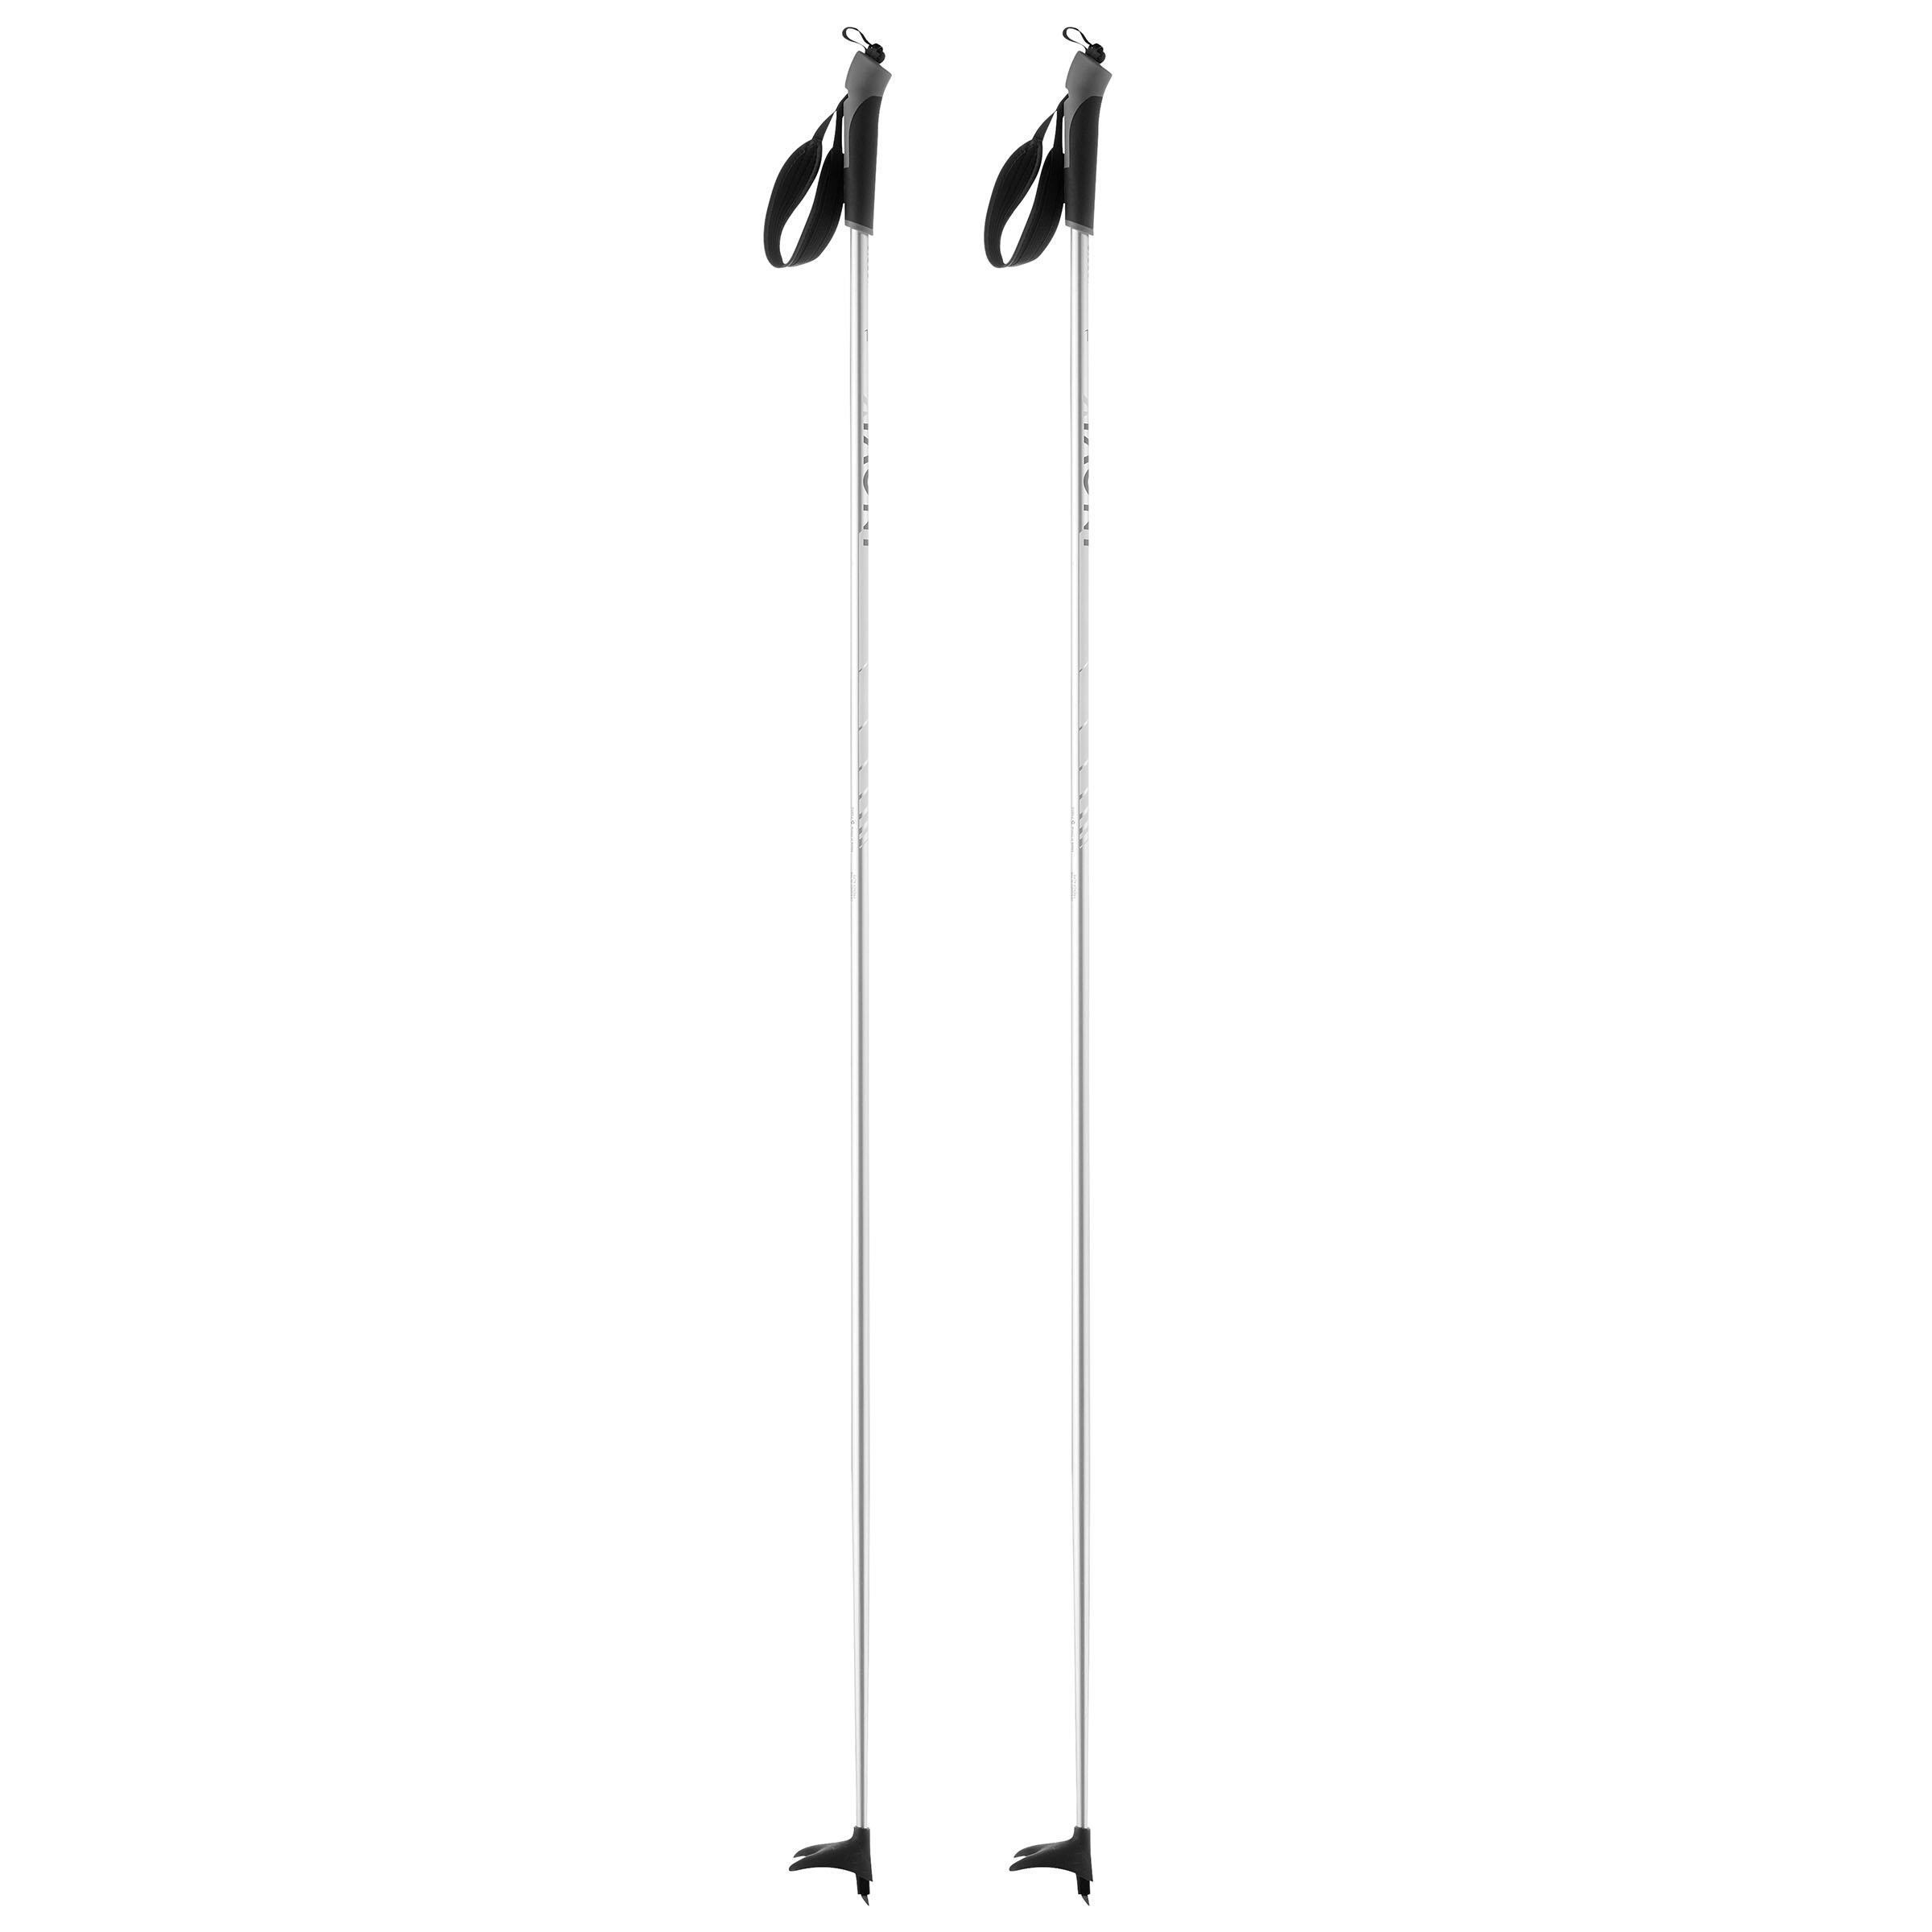 Bâtons de skis de fond adulte XC S BÂTON 120